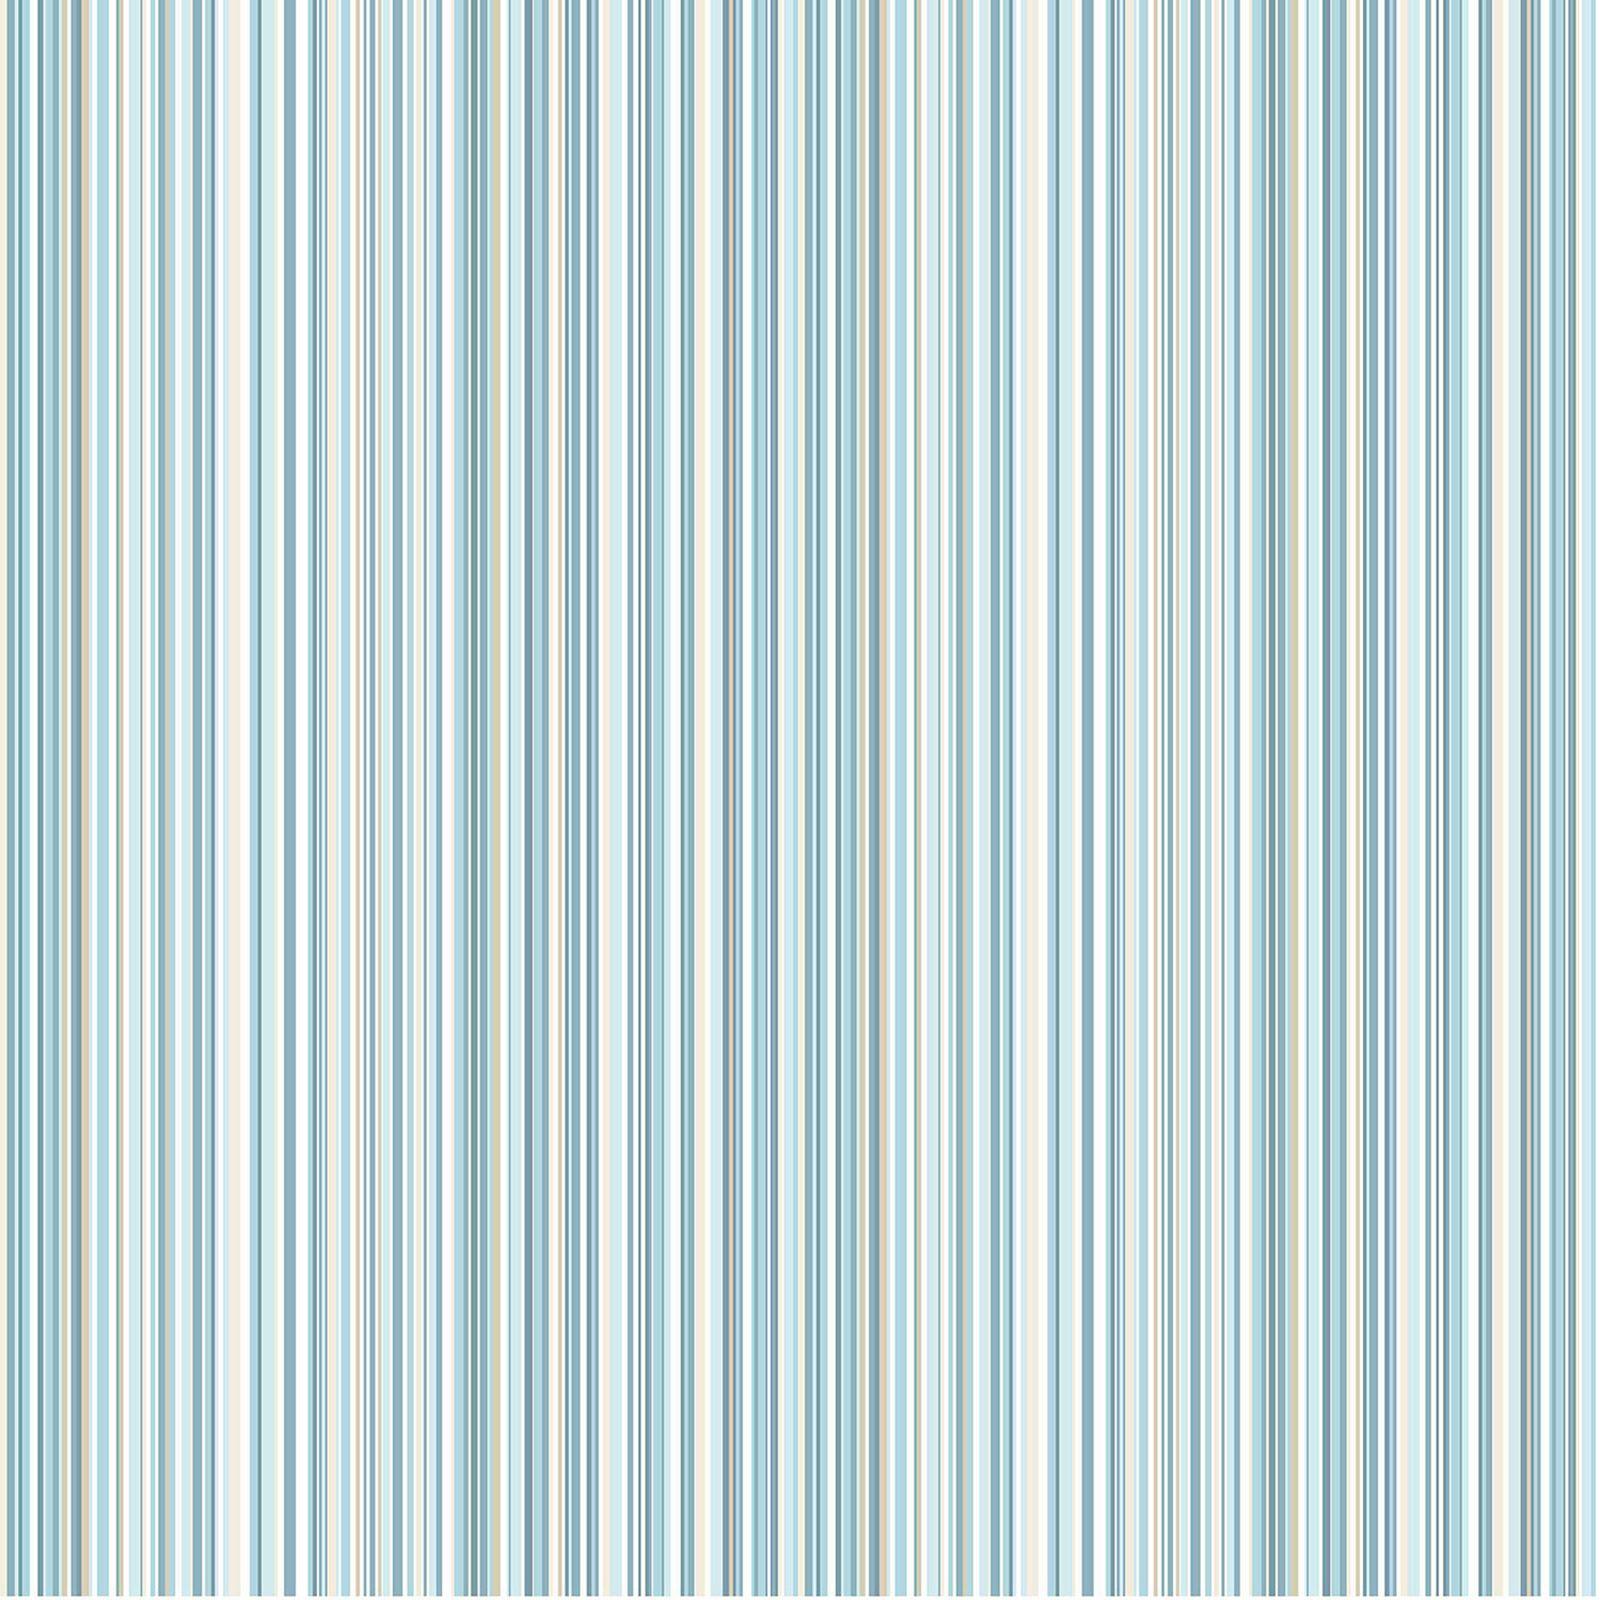 Direct Selling Home Decor Stripe Wallpaper By P S Rasch Vymura Direct Cww Fine